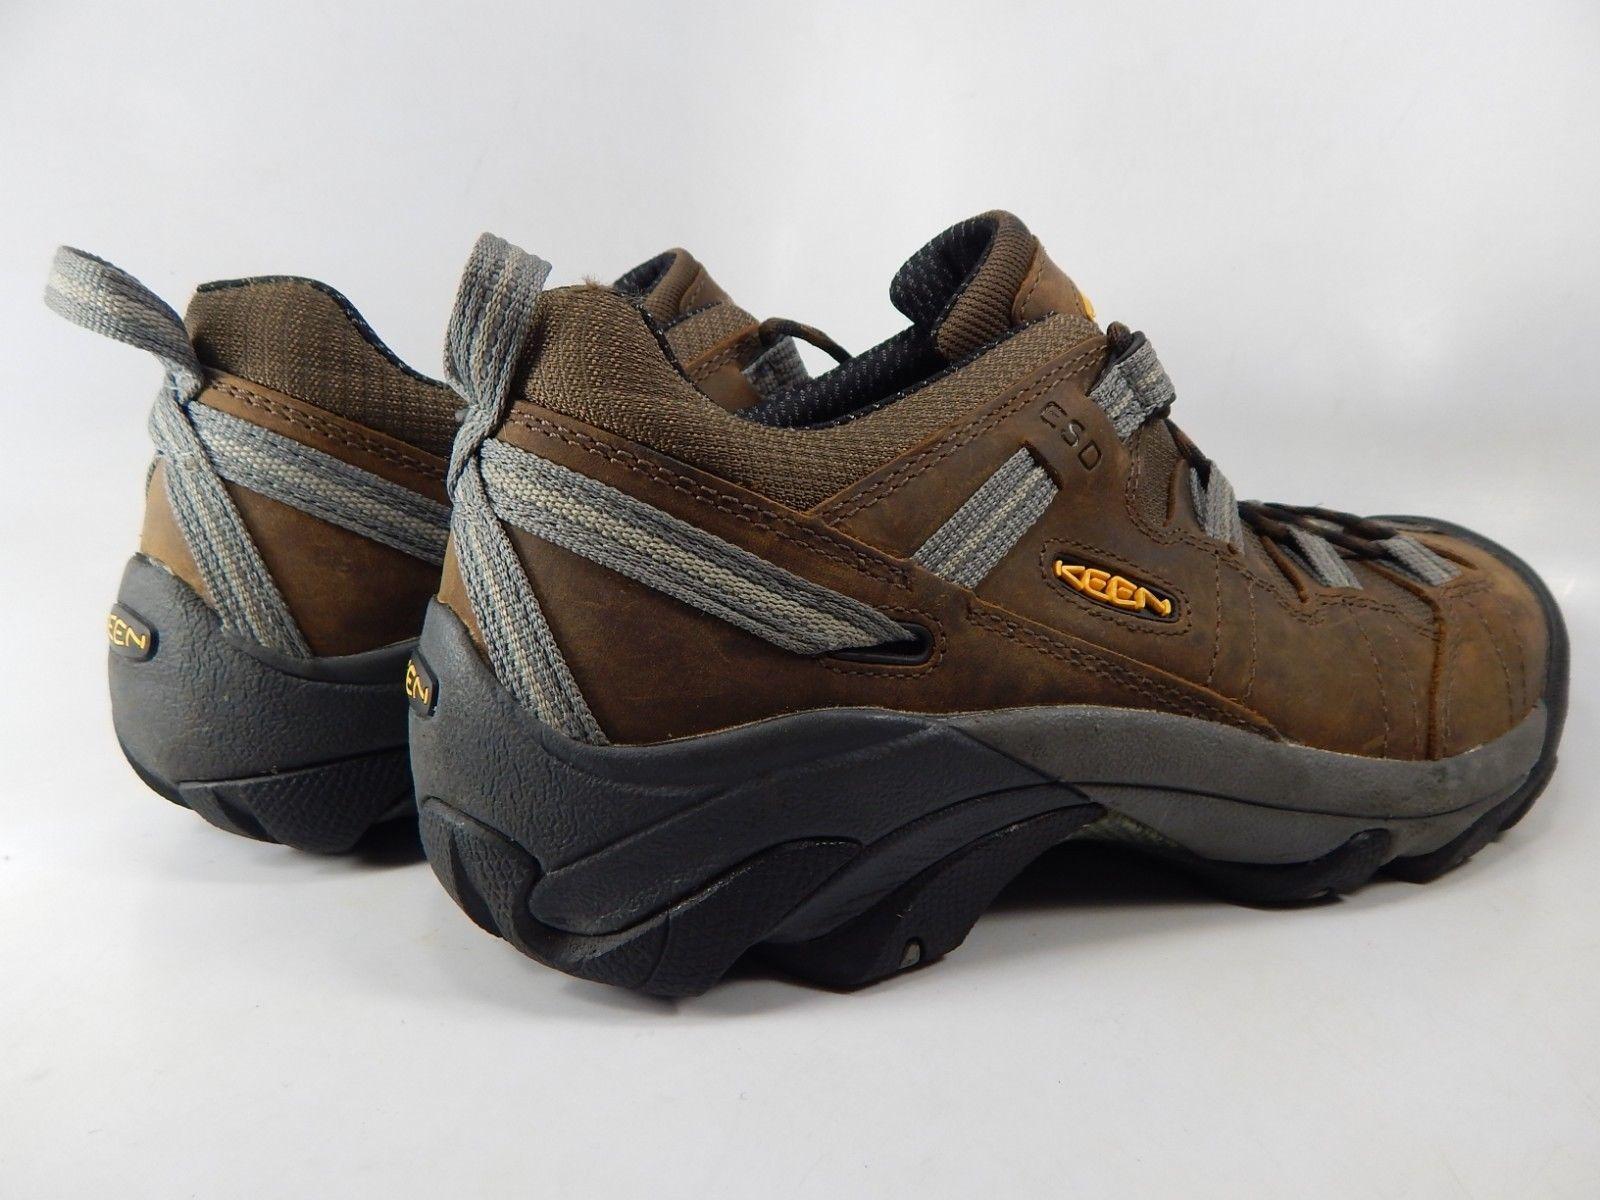 Keen Detroit ESD Low Top Sz 9.5 M (D) EU 42.5 Men's Steel Toe Work Shoes 1007012